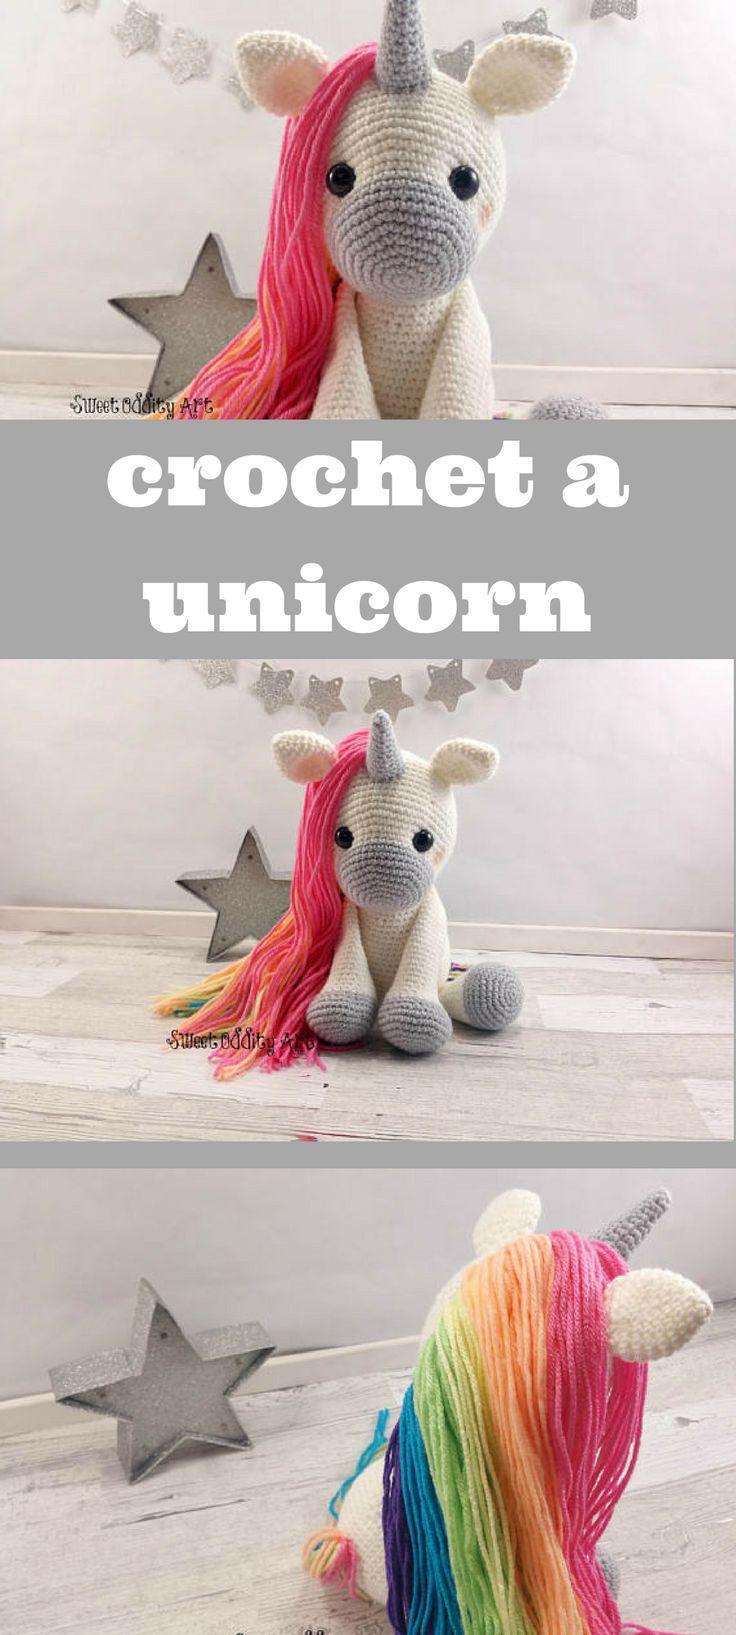 Pattern to crochet this super cute amigurumi unicorn doll! #amigurumi #affiliate #crochepattern #unicorn